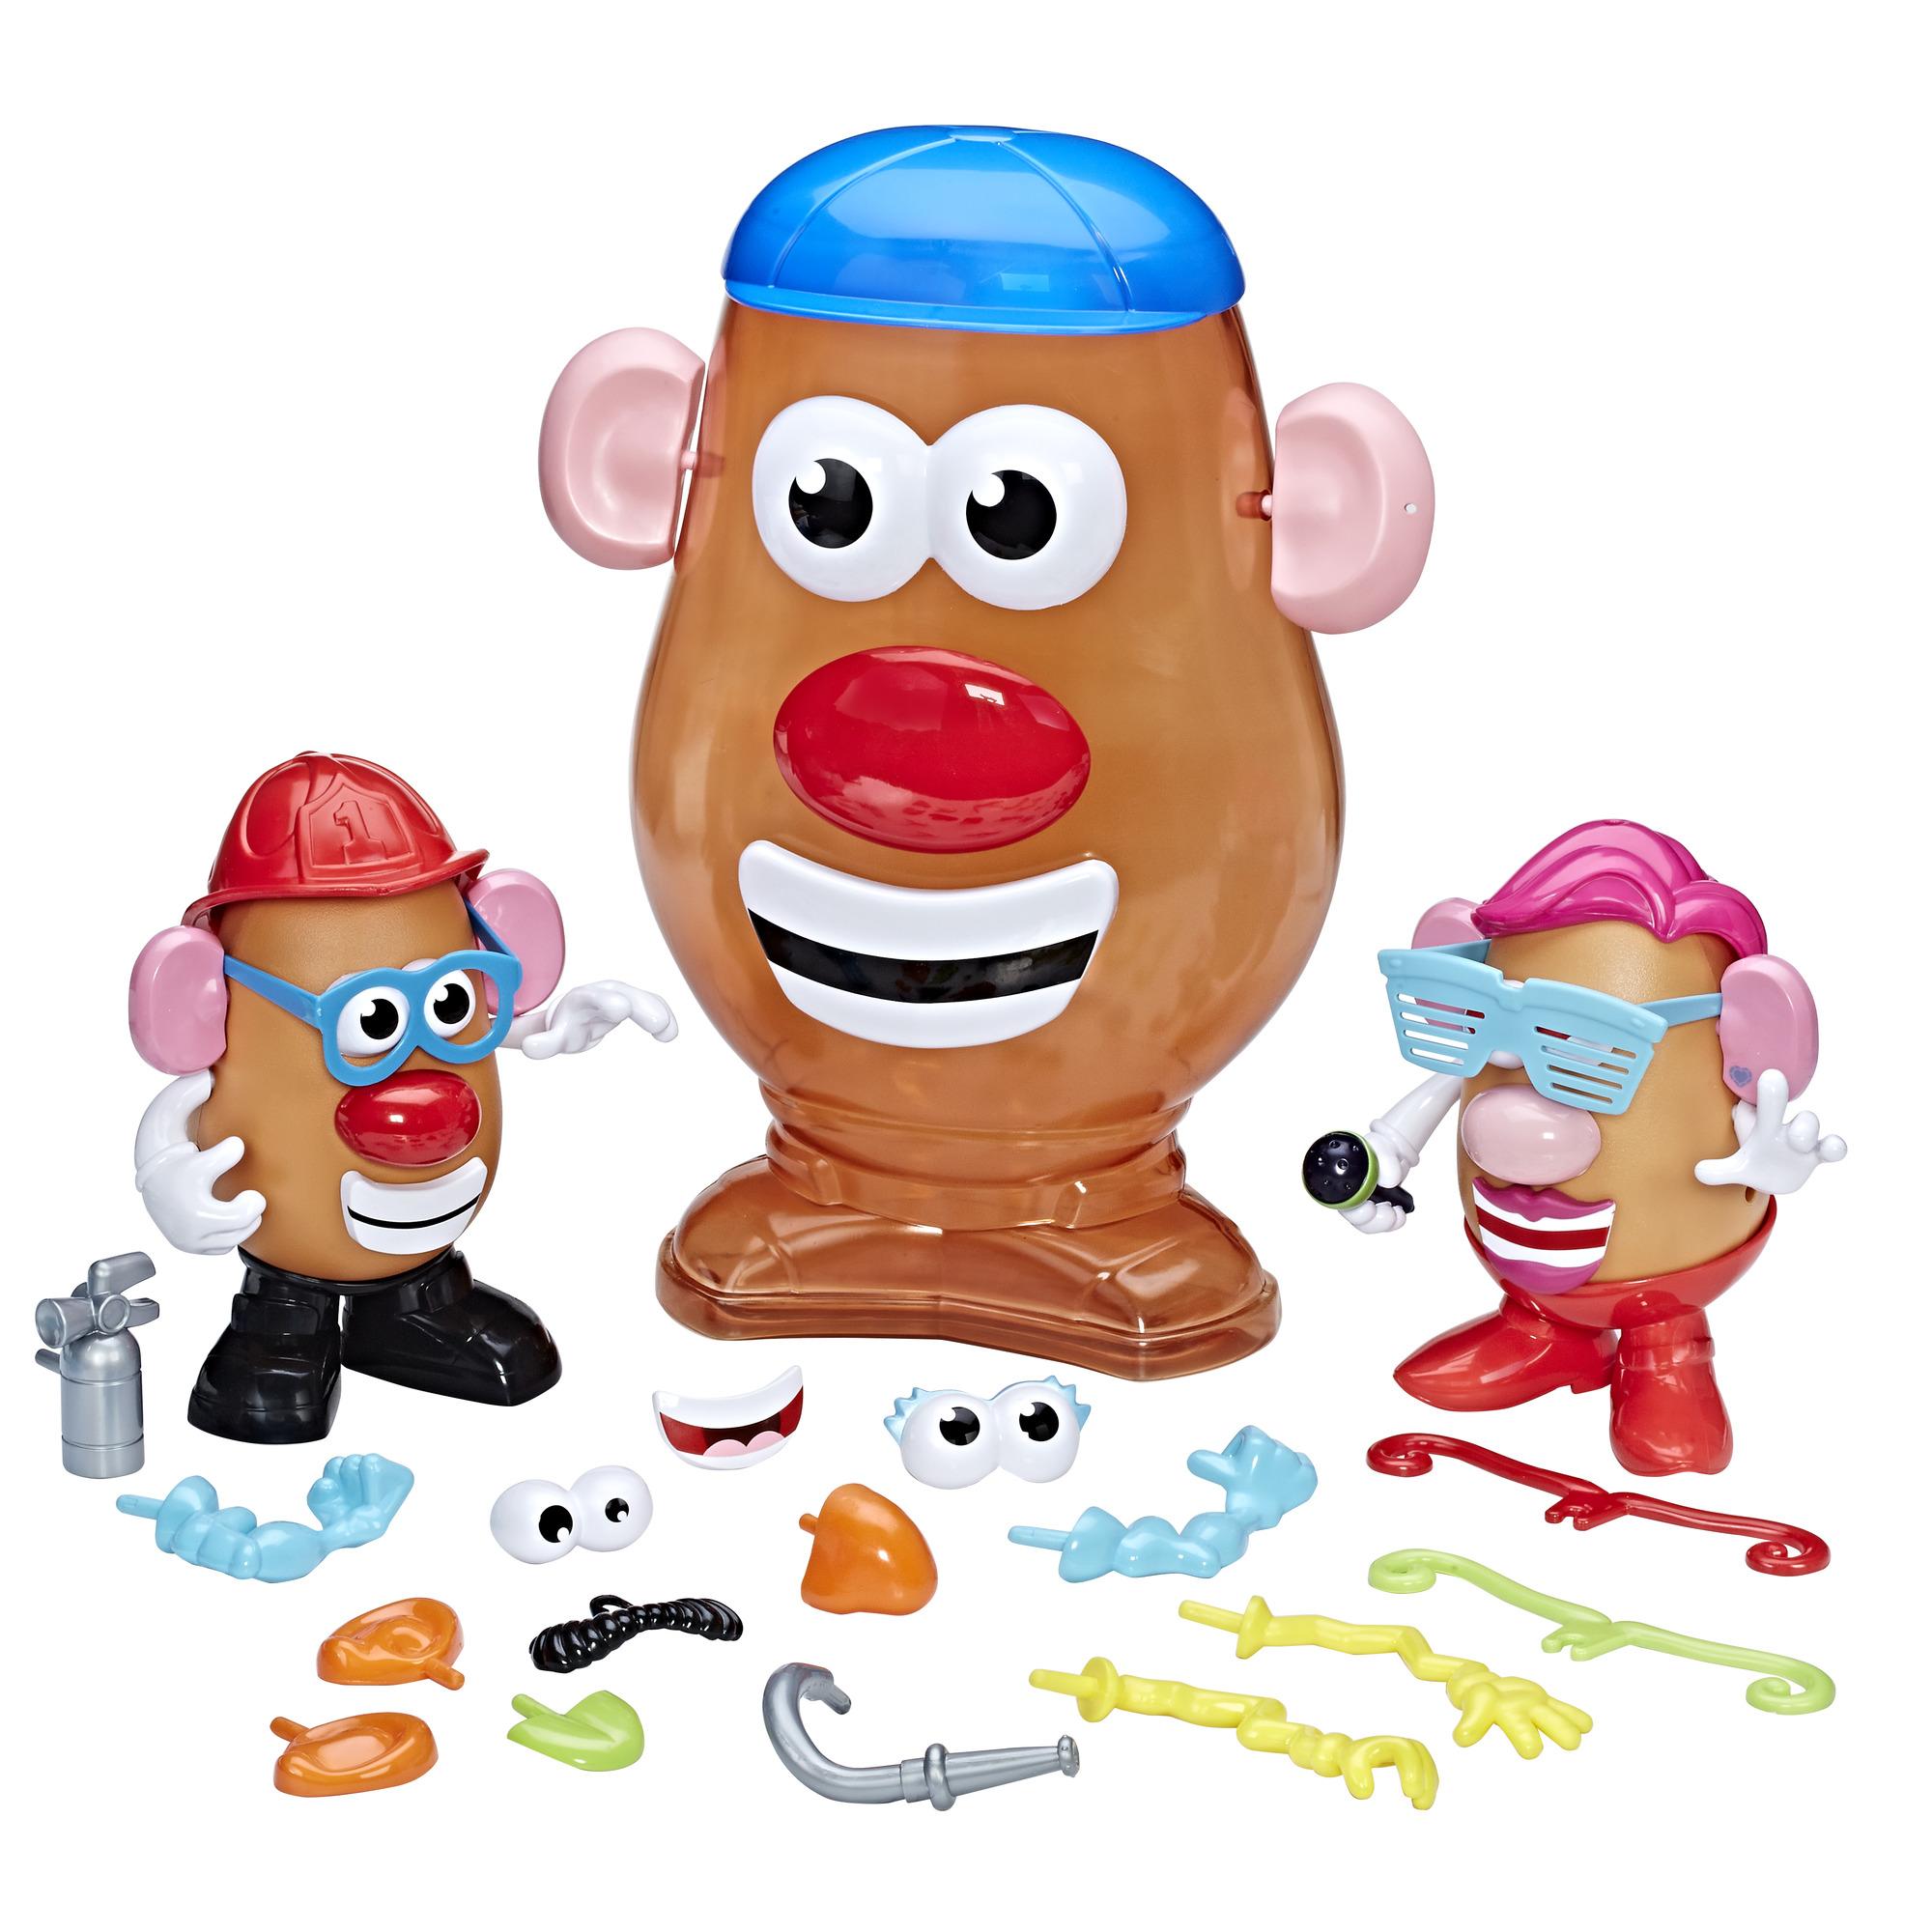 Playskool Friends Mr. Potato Head Spud Set PartNumber: 004W009652925001P KsnValue: 9652925 MfgPartNumber: C1240